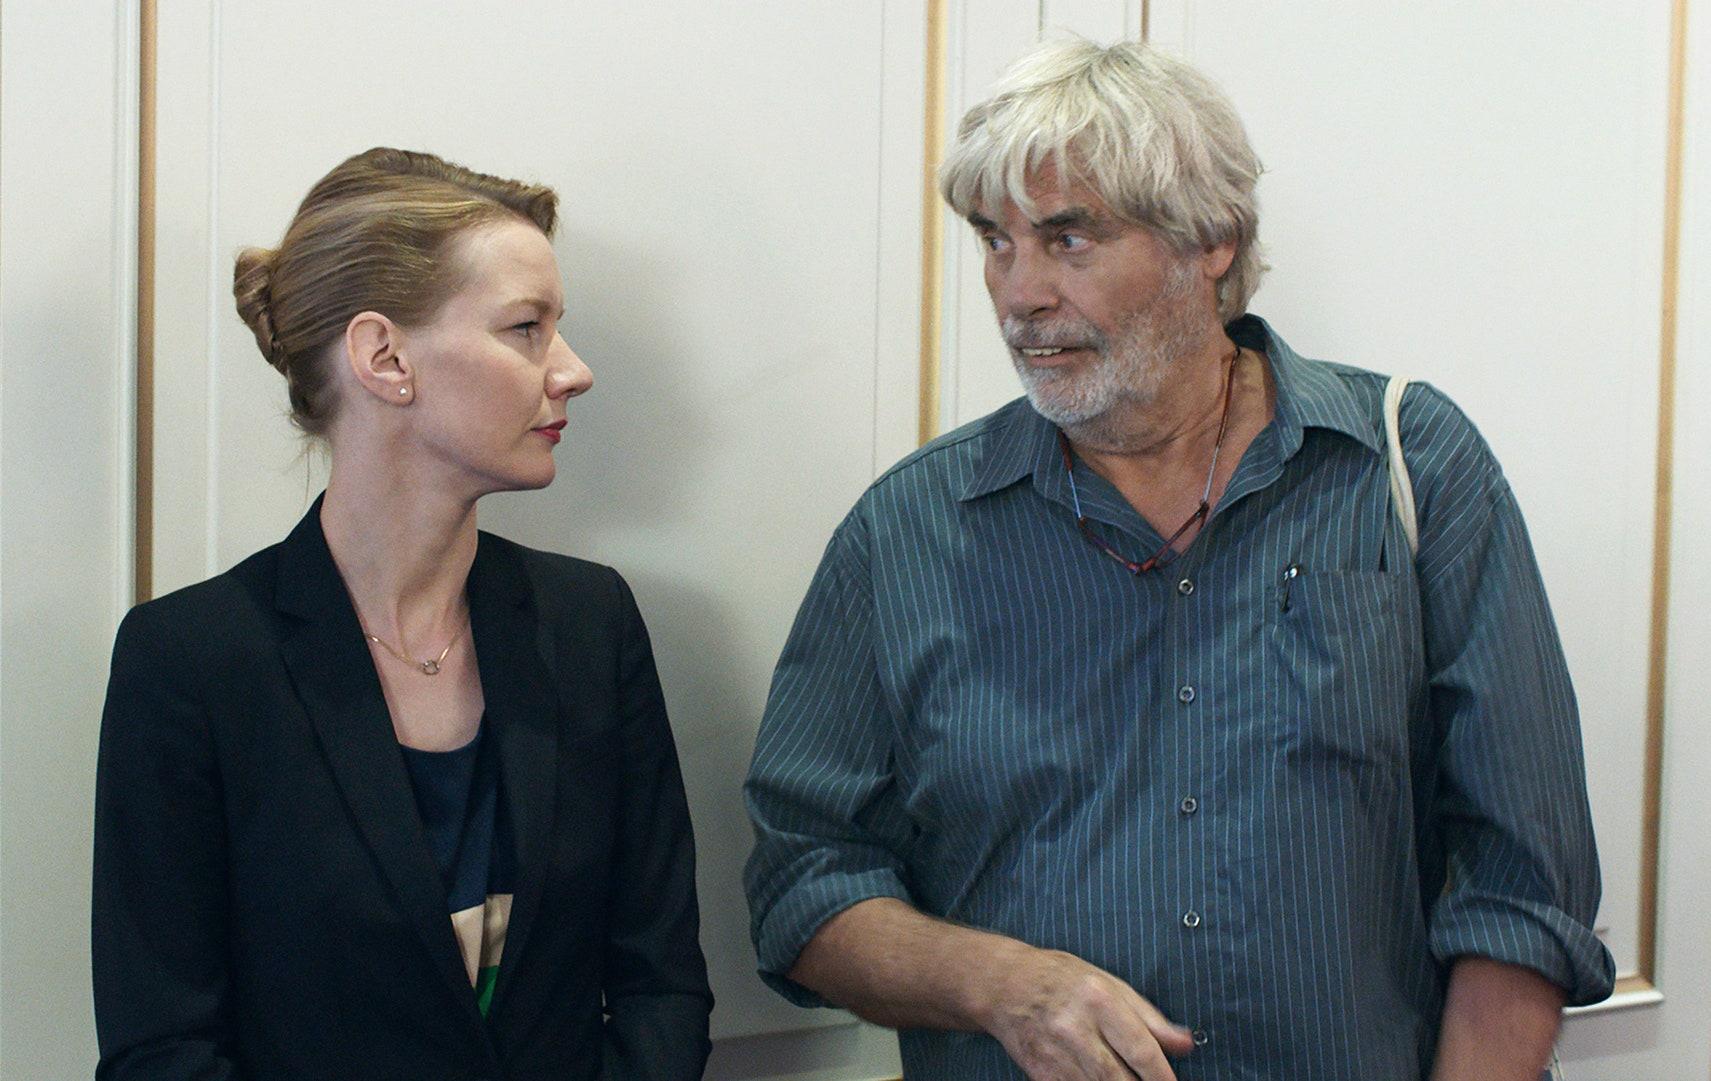 Cannes Film Festival 2016 Winner Predictions